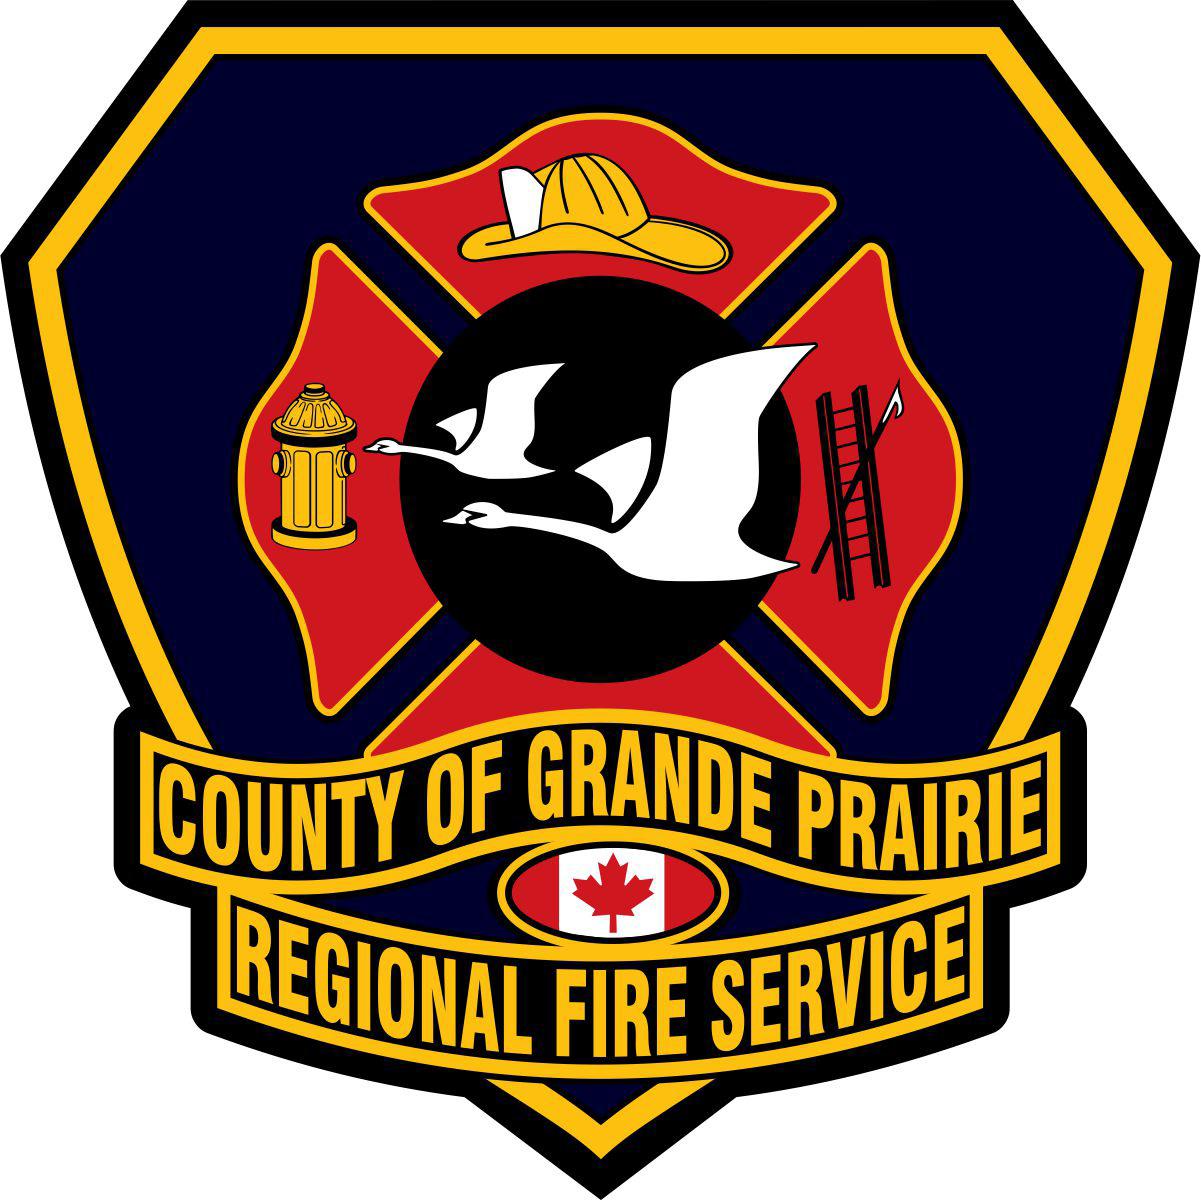 County of Grand Prairie Regional Fire Service